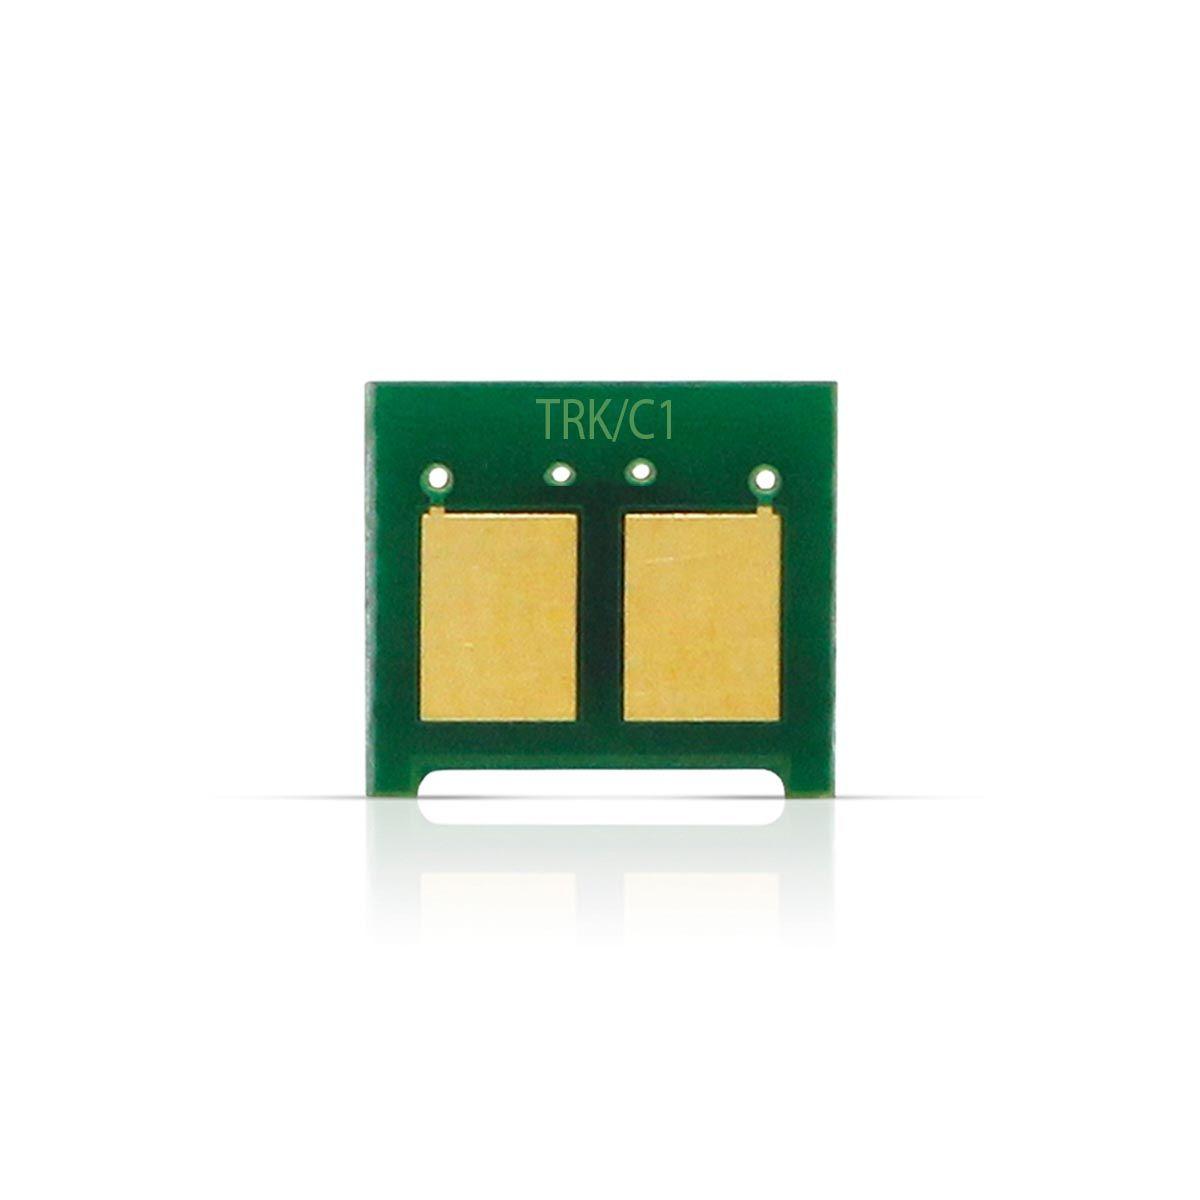 SMART CHIP HP CB540A/CC530A/CE250A/310A/320A/400A/410A/CF210A/380A PRETO (TRK/C1)